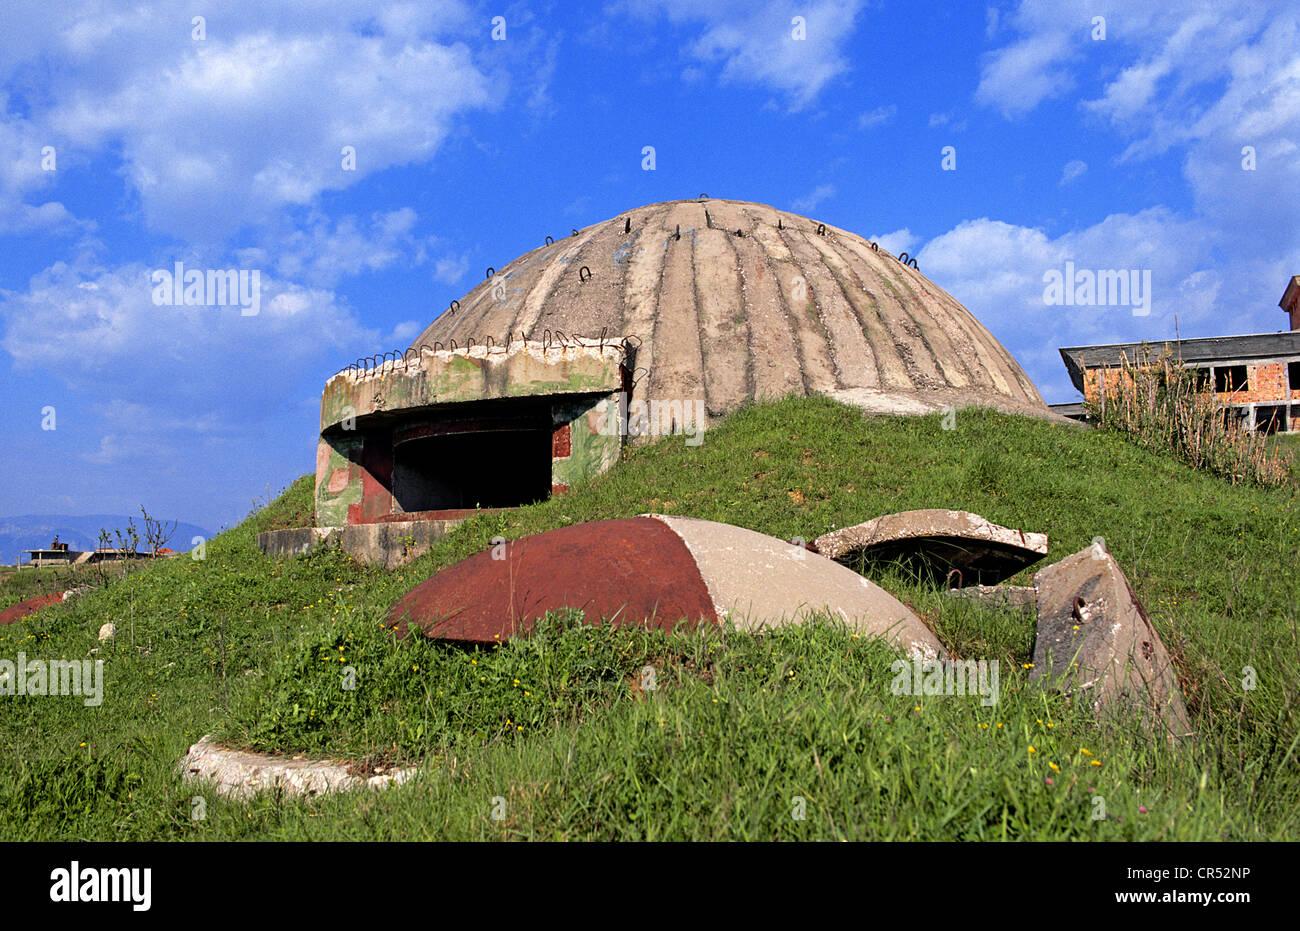 Albania, surroundings of Tirana, bunker on the road towards Durres - Stock Image